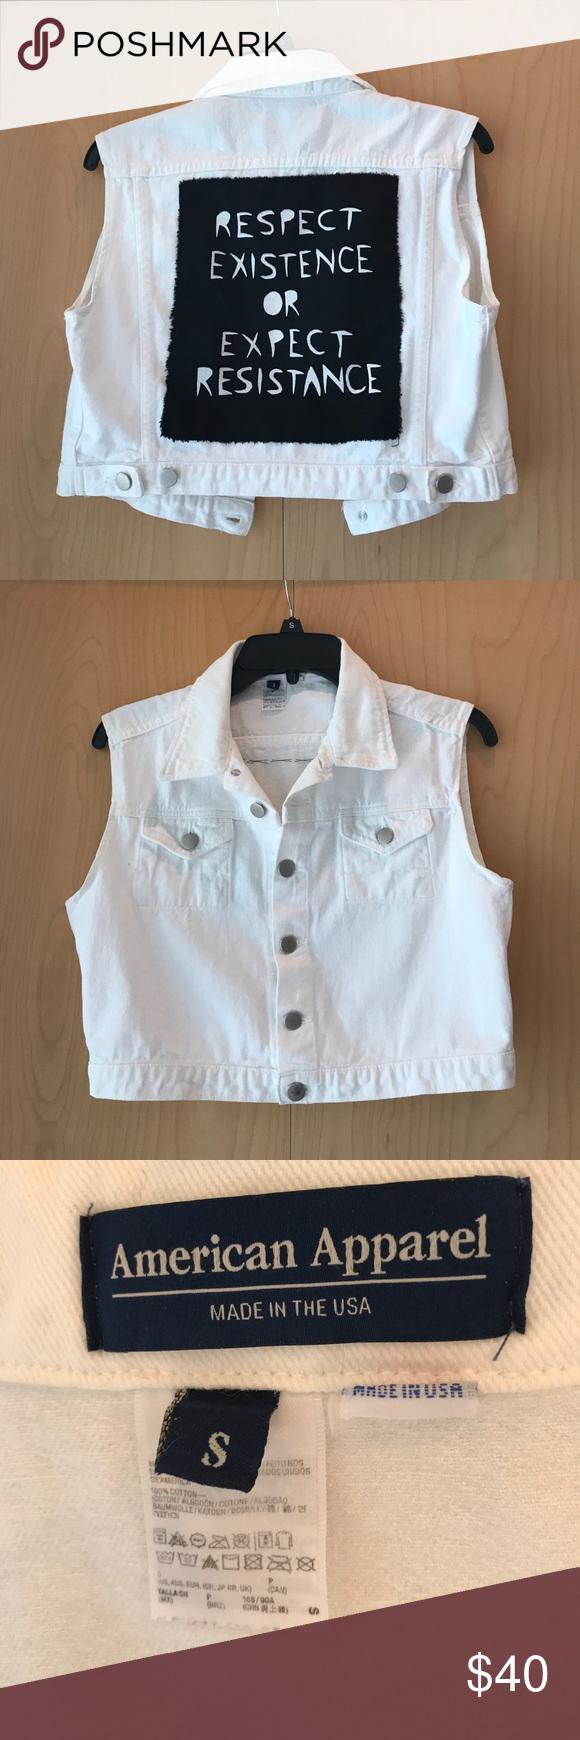 c45cf0659dc White denim vest with back patch